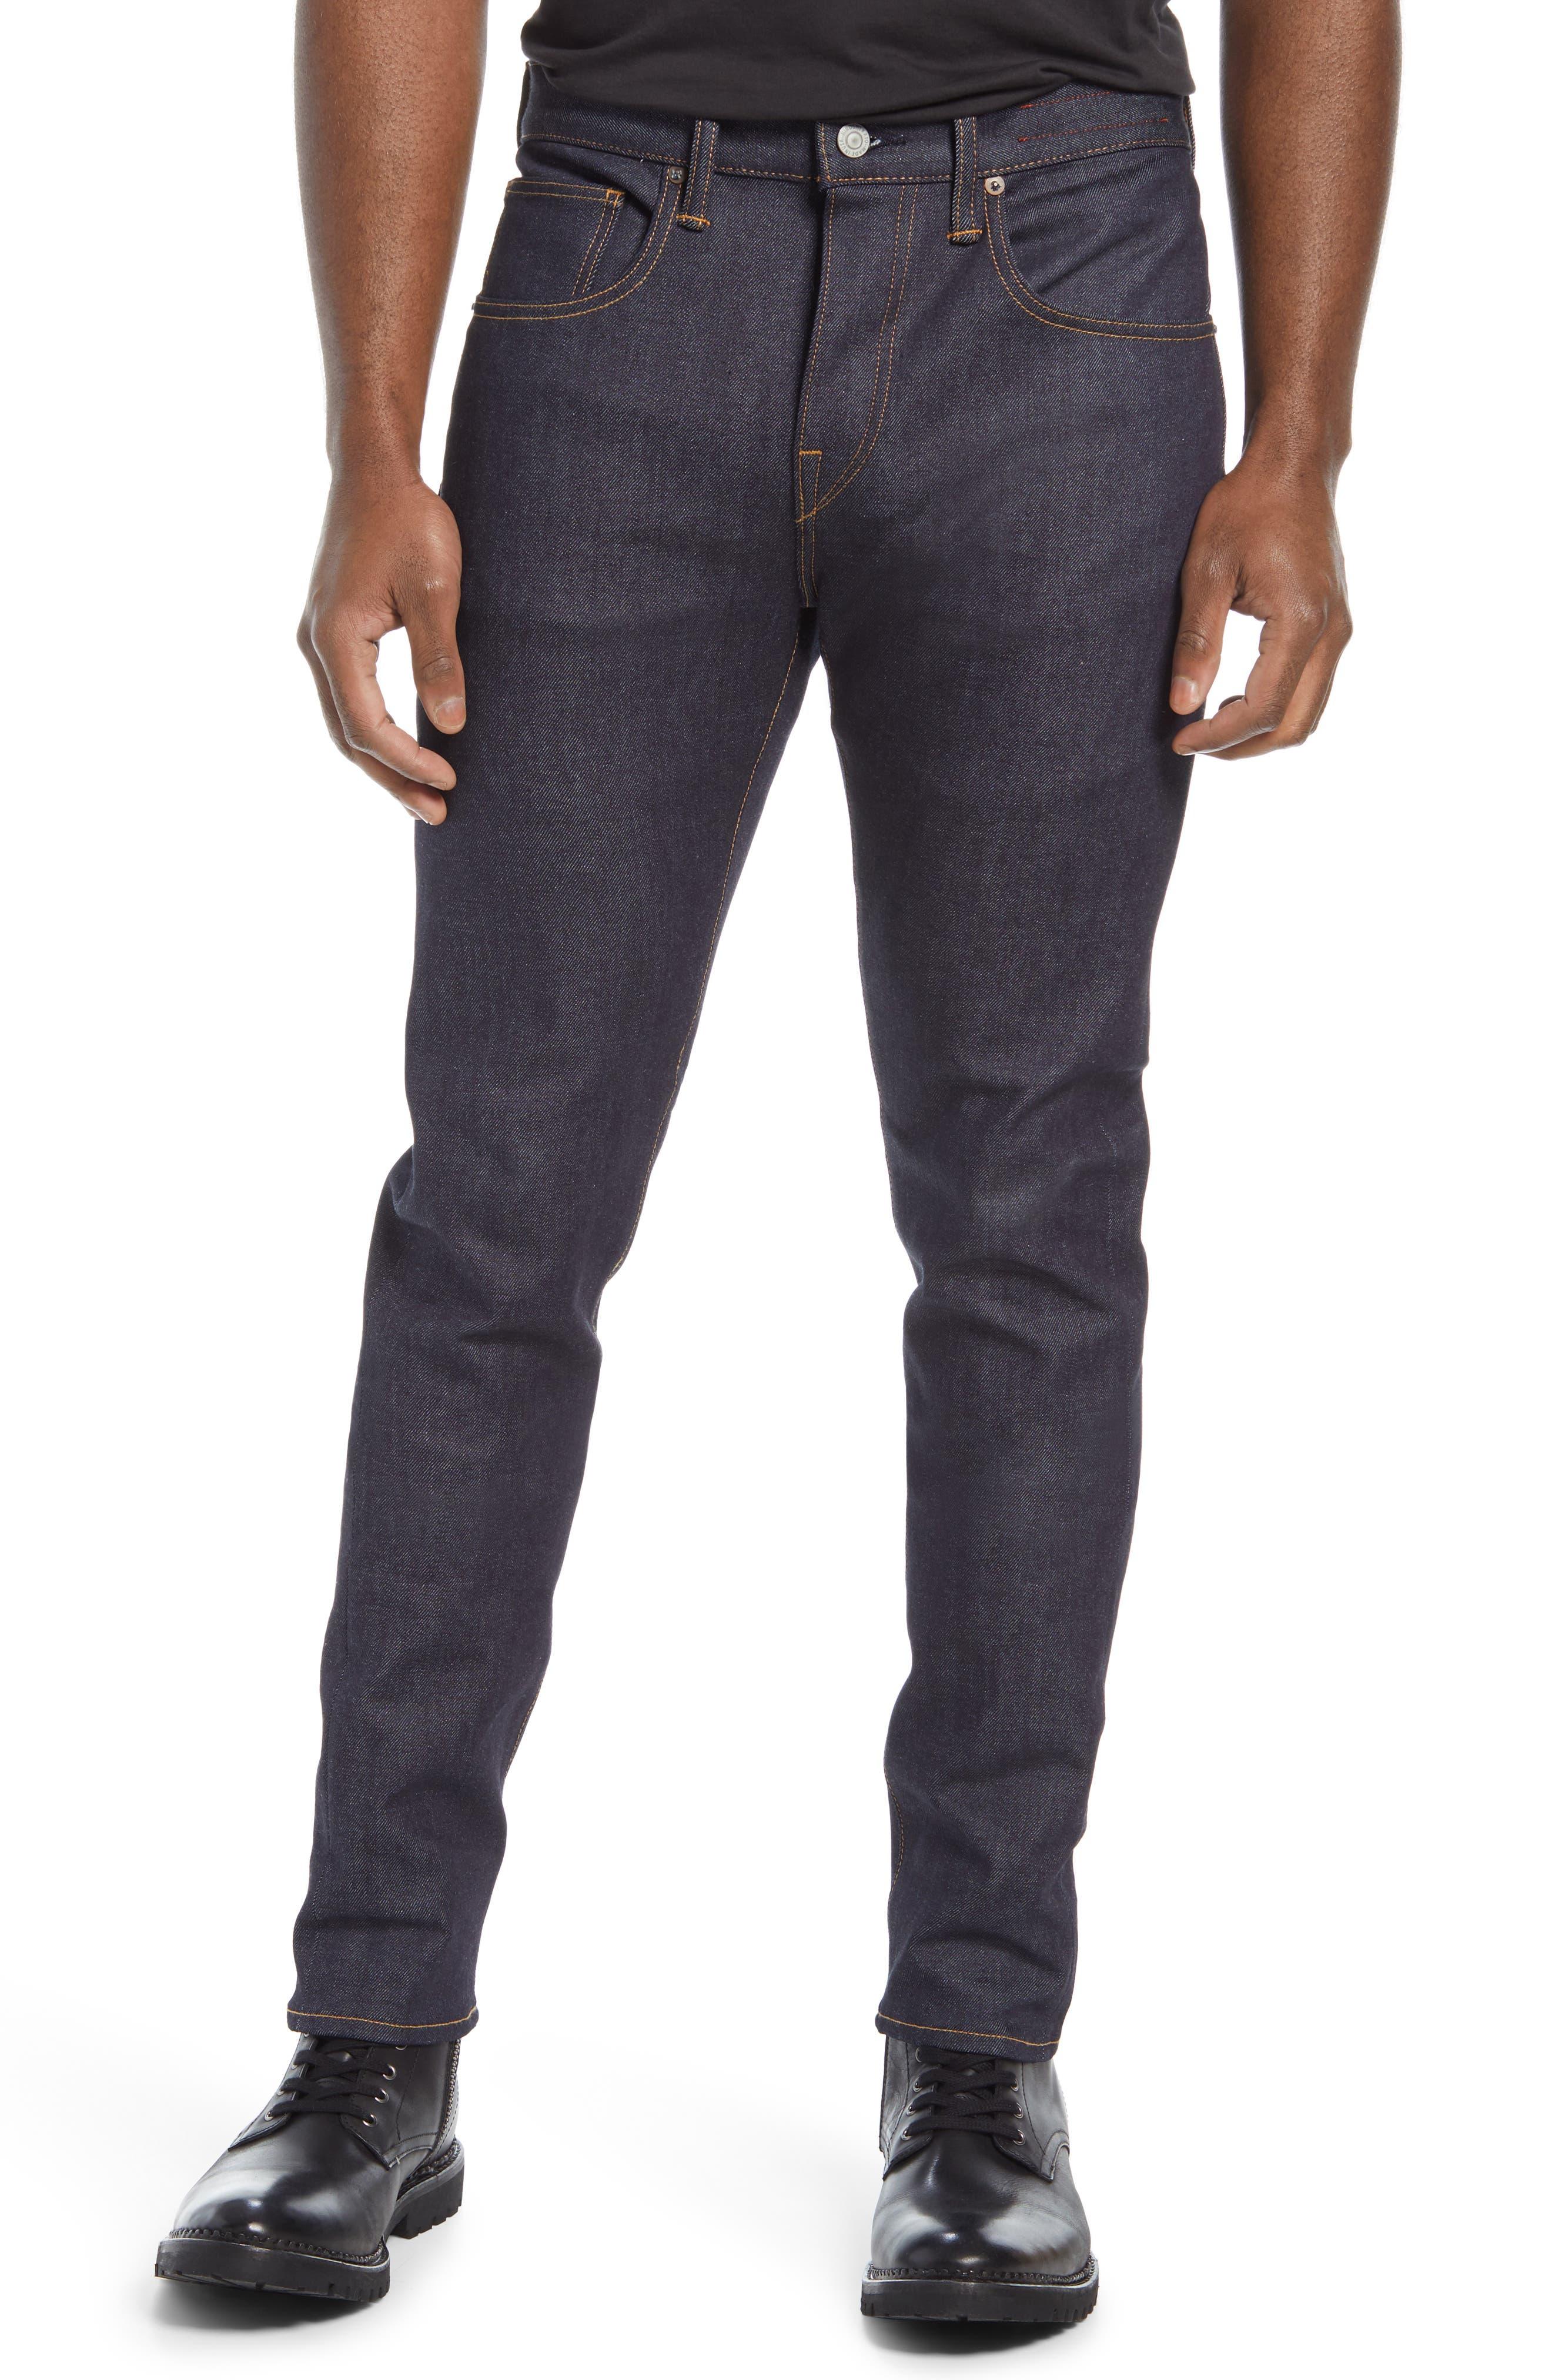 The Scissors Slim Tapered Jeans